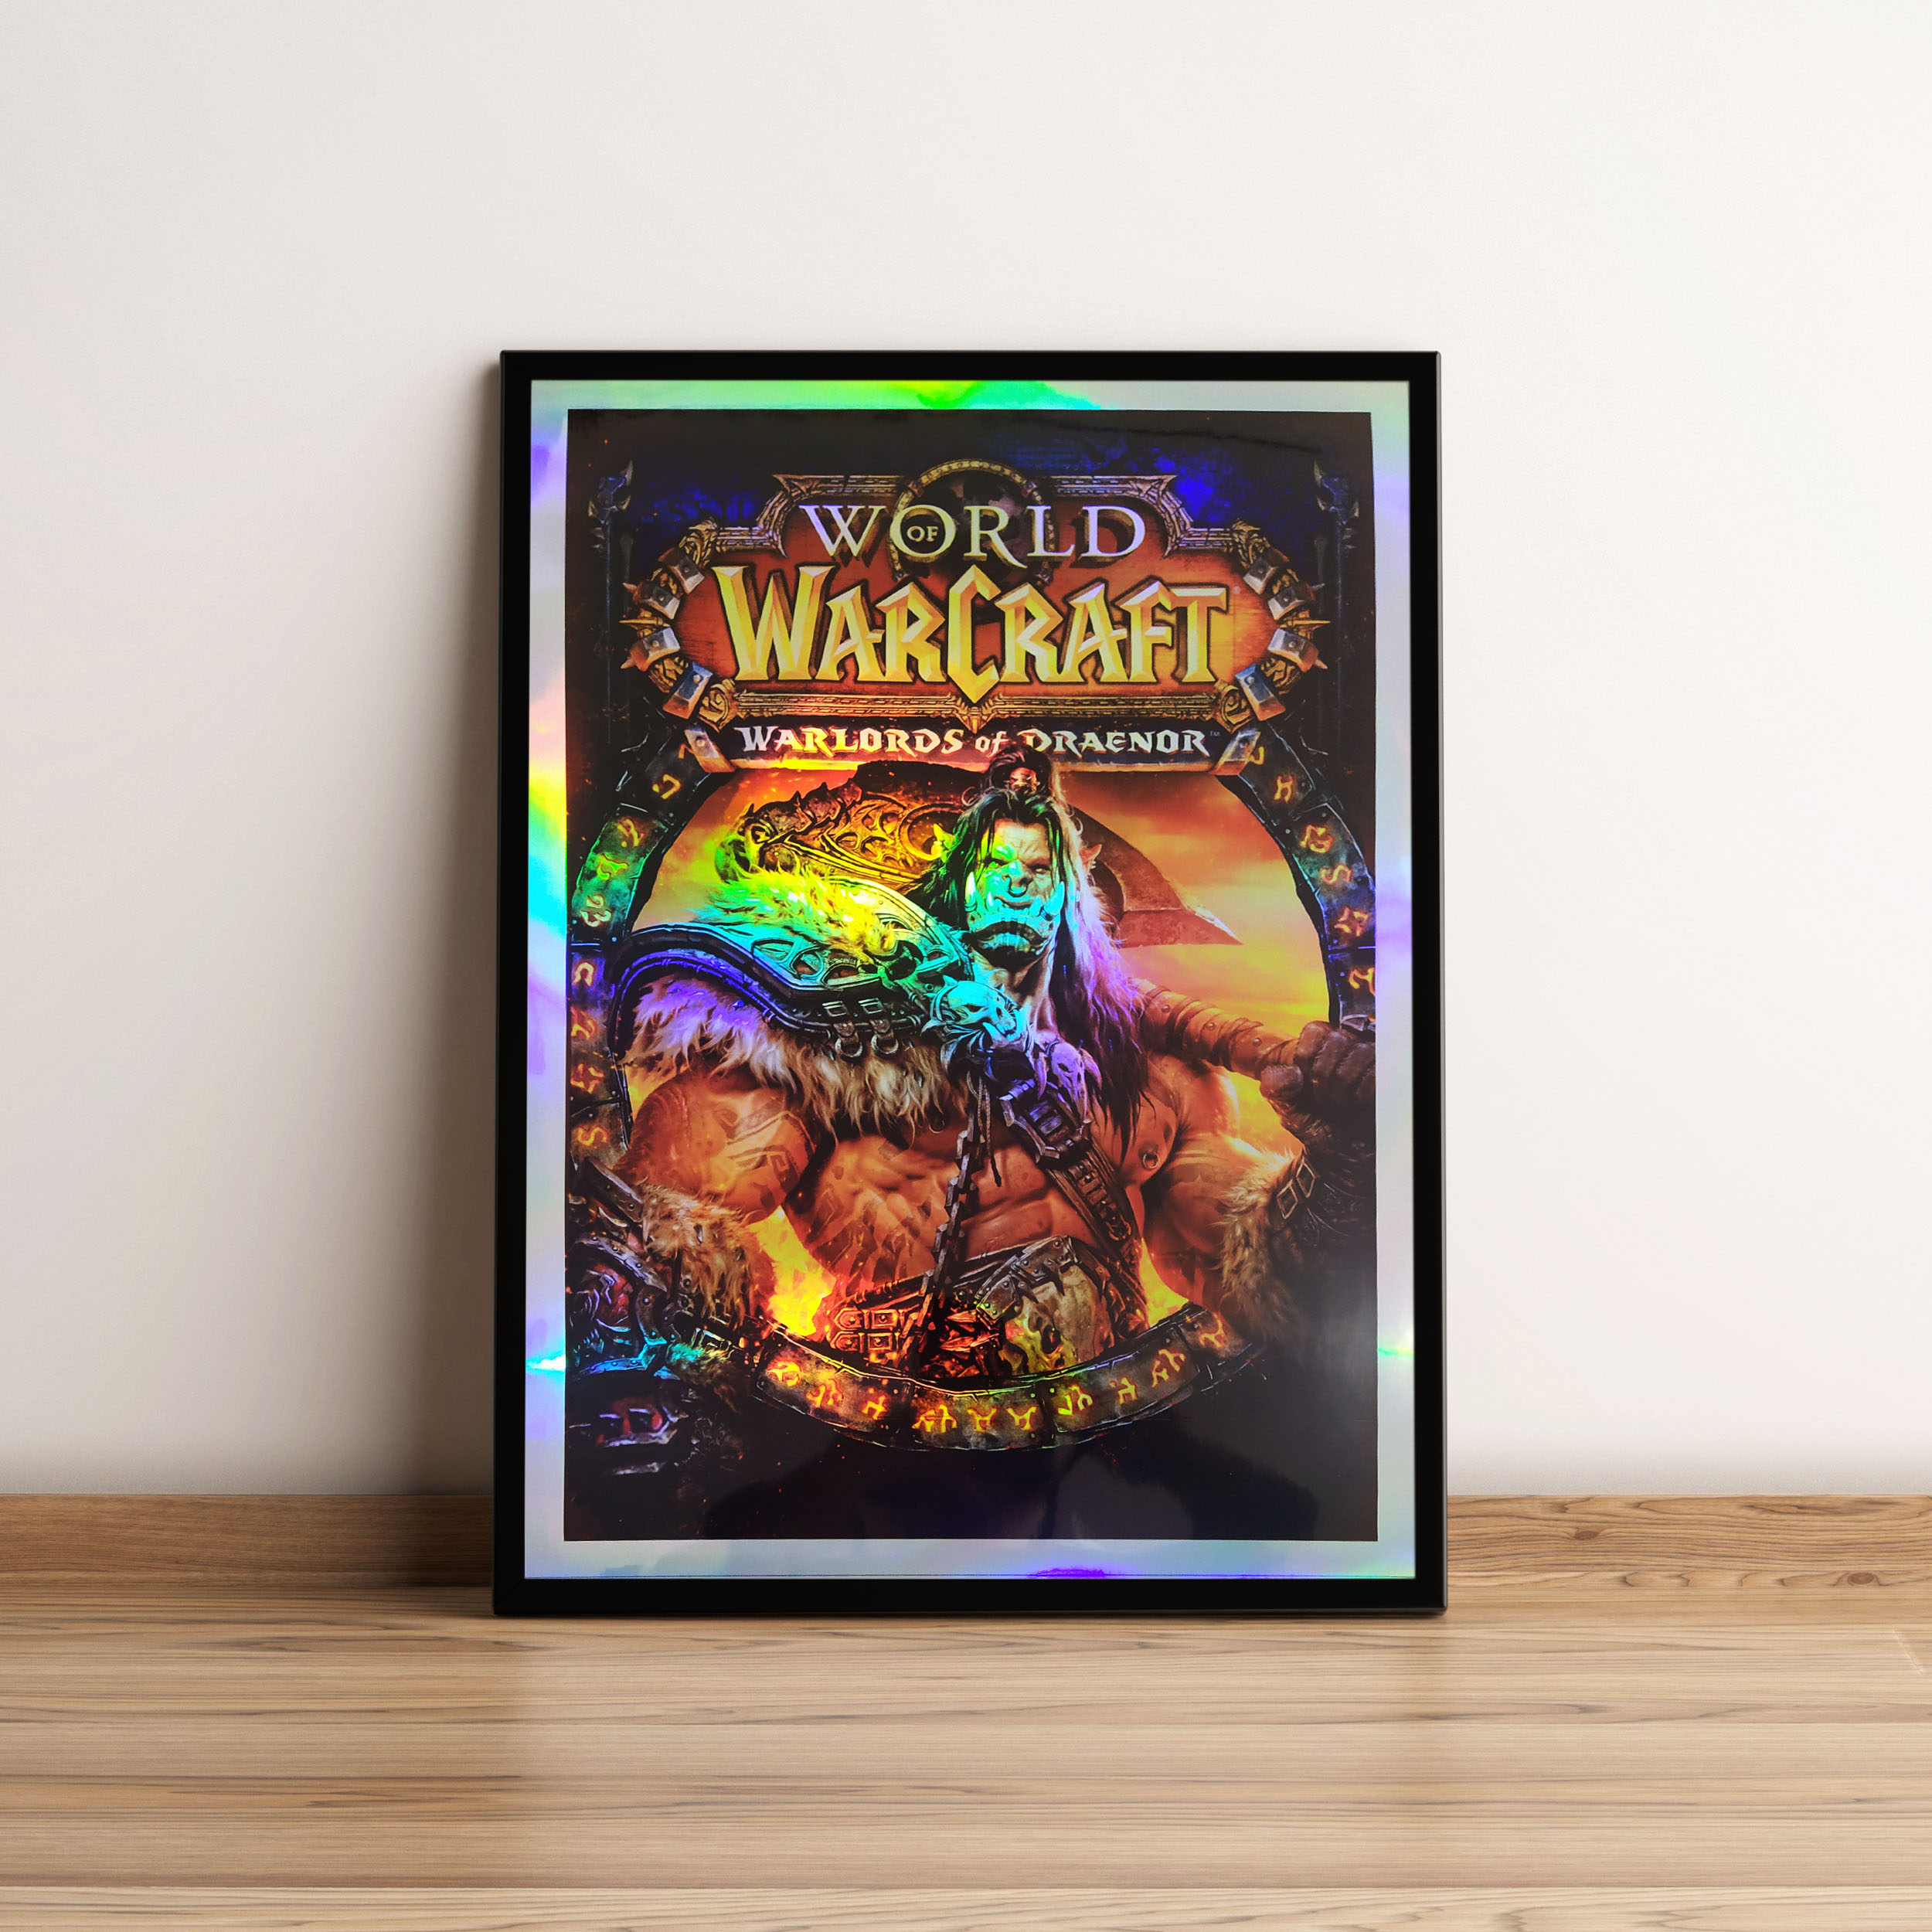 wordl of wrcarft